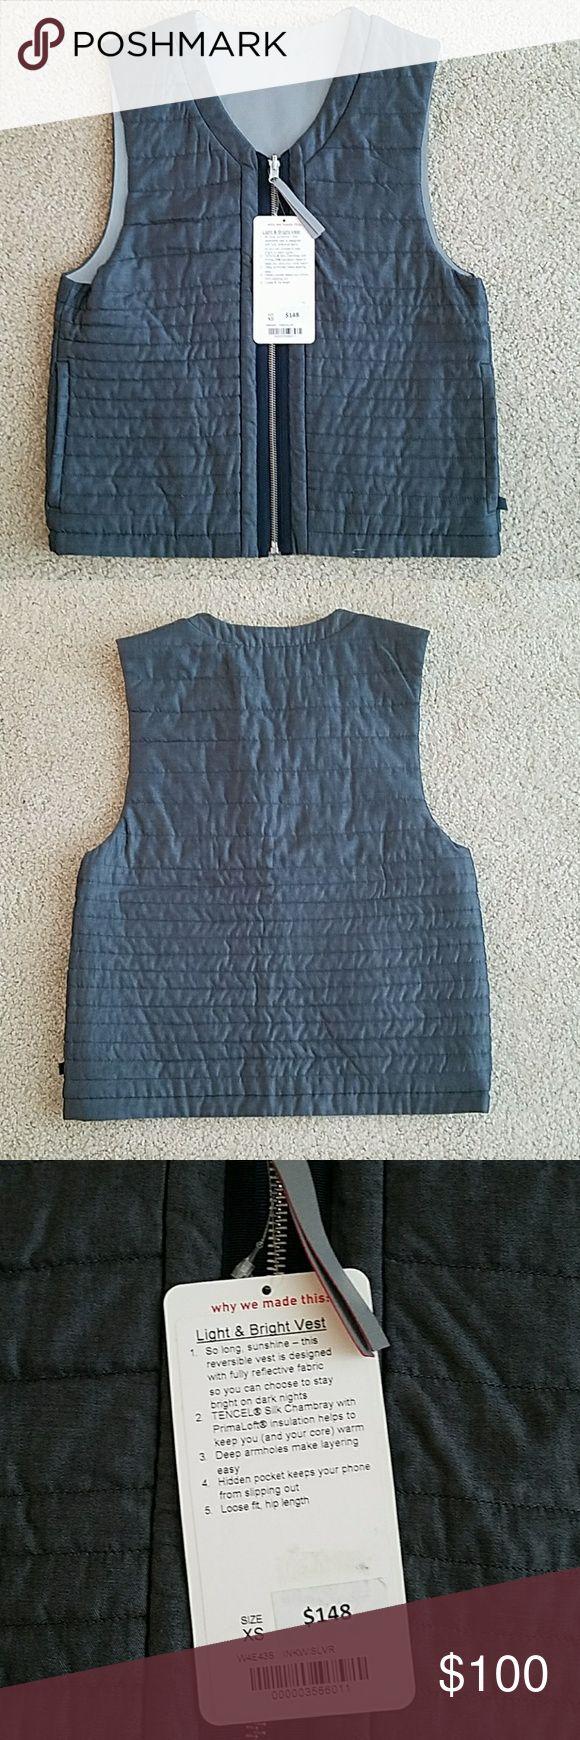 Lululemon Vest Lululemon light and bright Vest lululemon athletica Jackets & Coats Vests